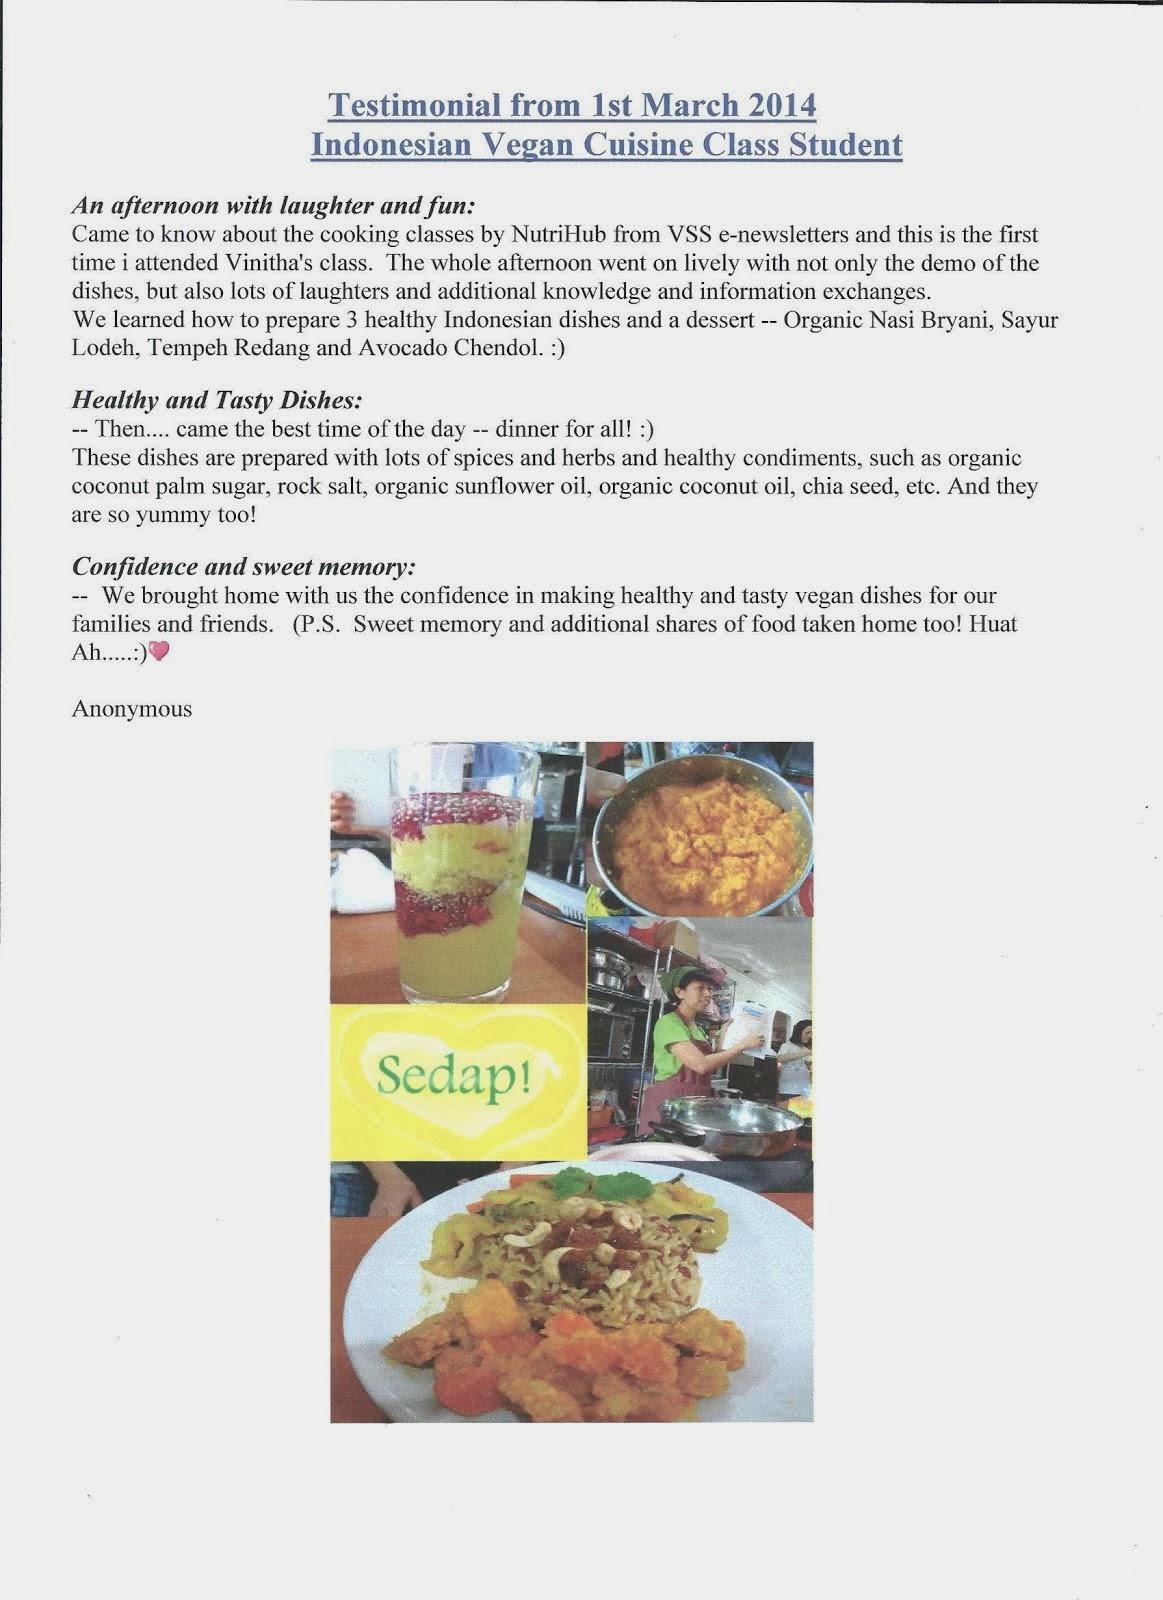 Sedap ! Photos and Testimonial from Indonesian Vegan Cuisine class Student